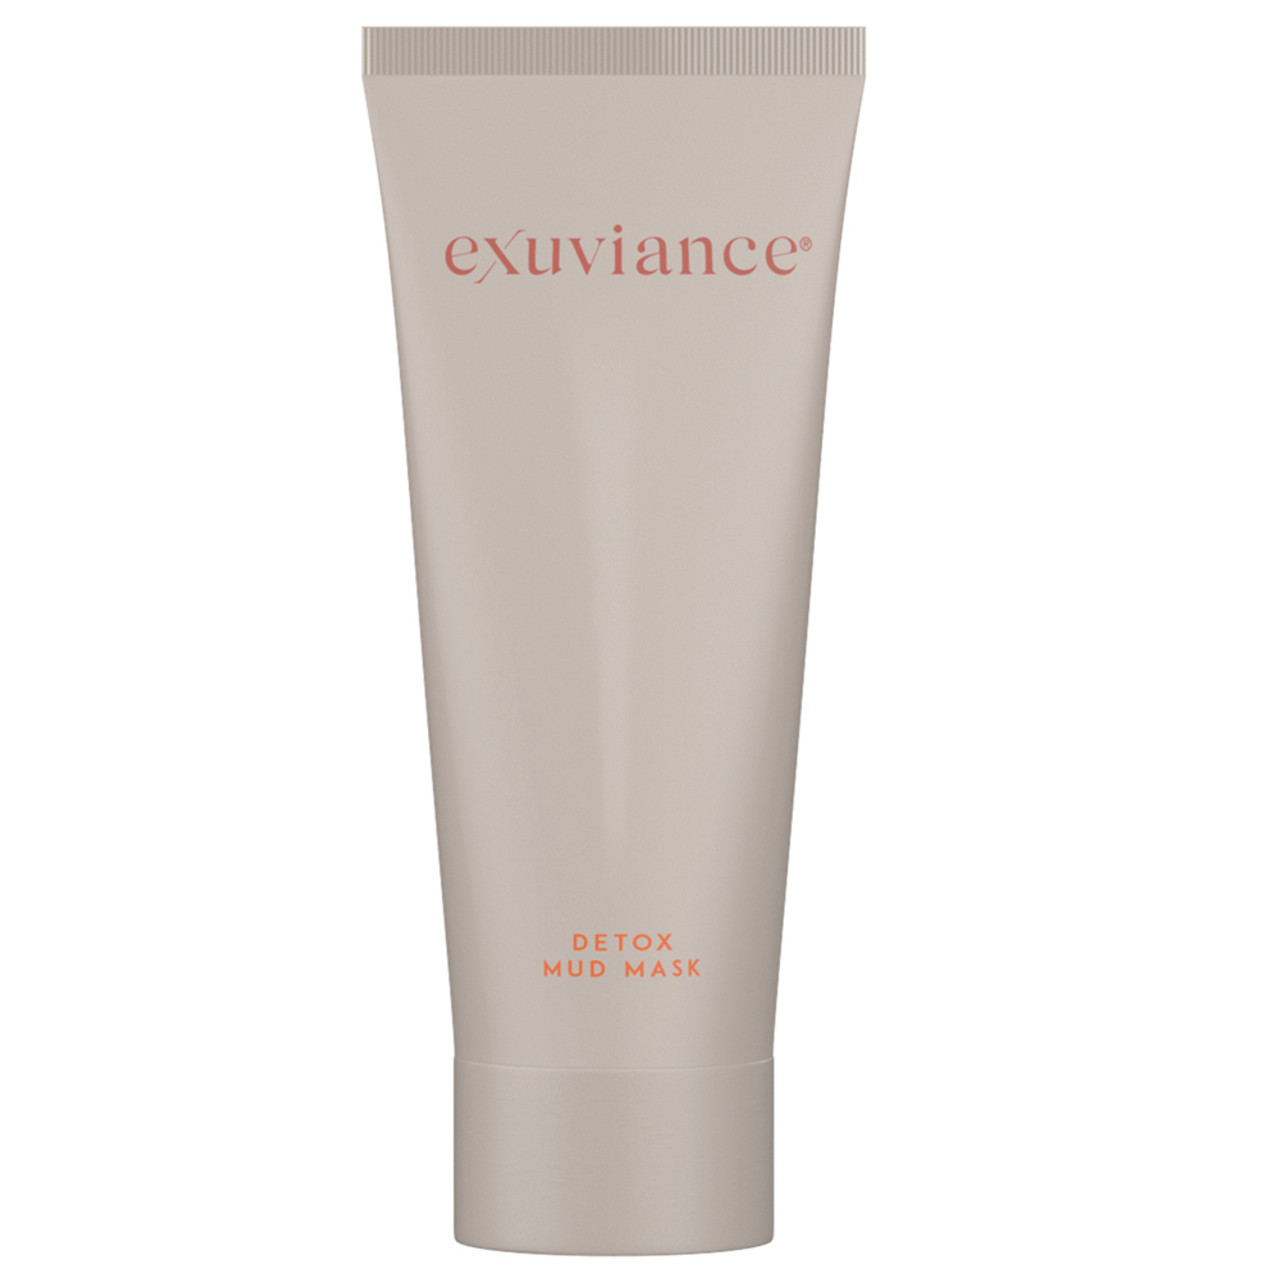 Exuviance Detox Mud Mask